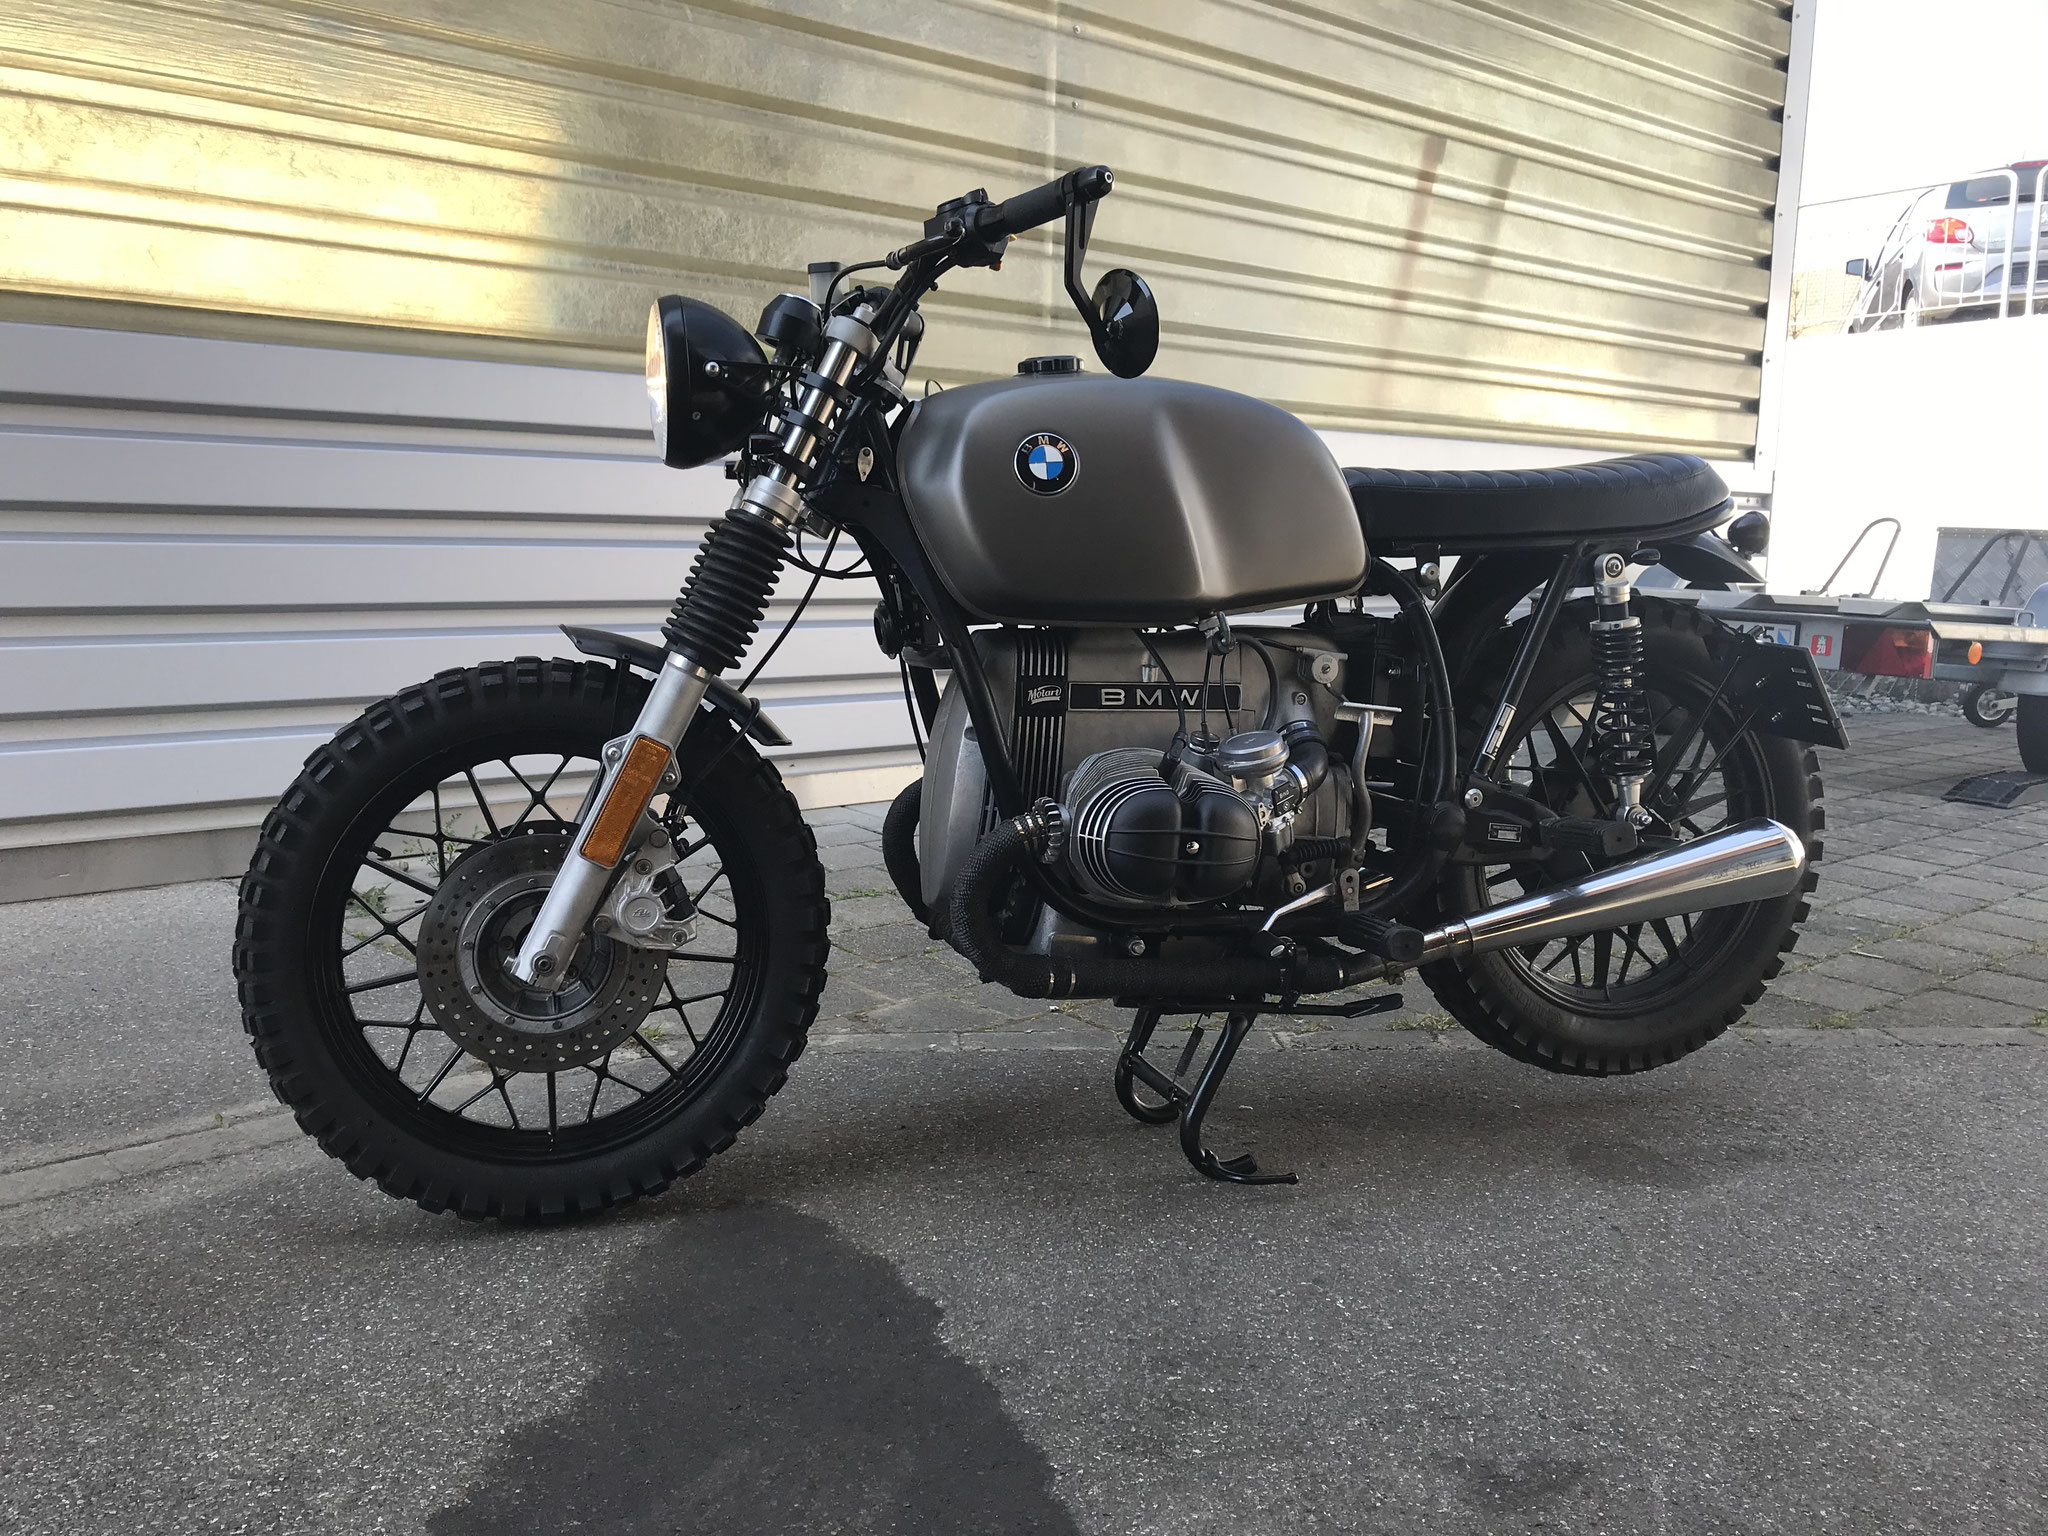 BMW R80 R65 Custom Umbau Hattech Anthrazit Heck DTC